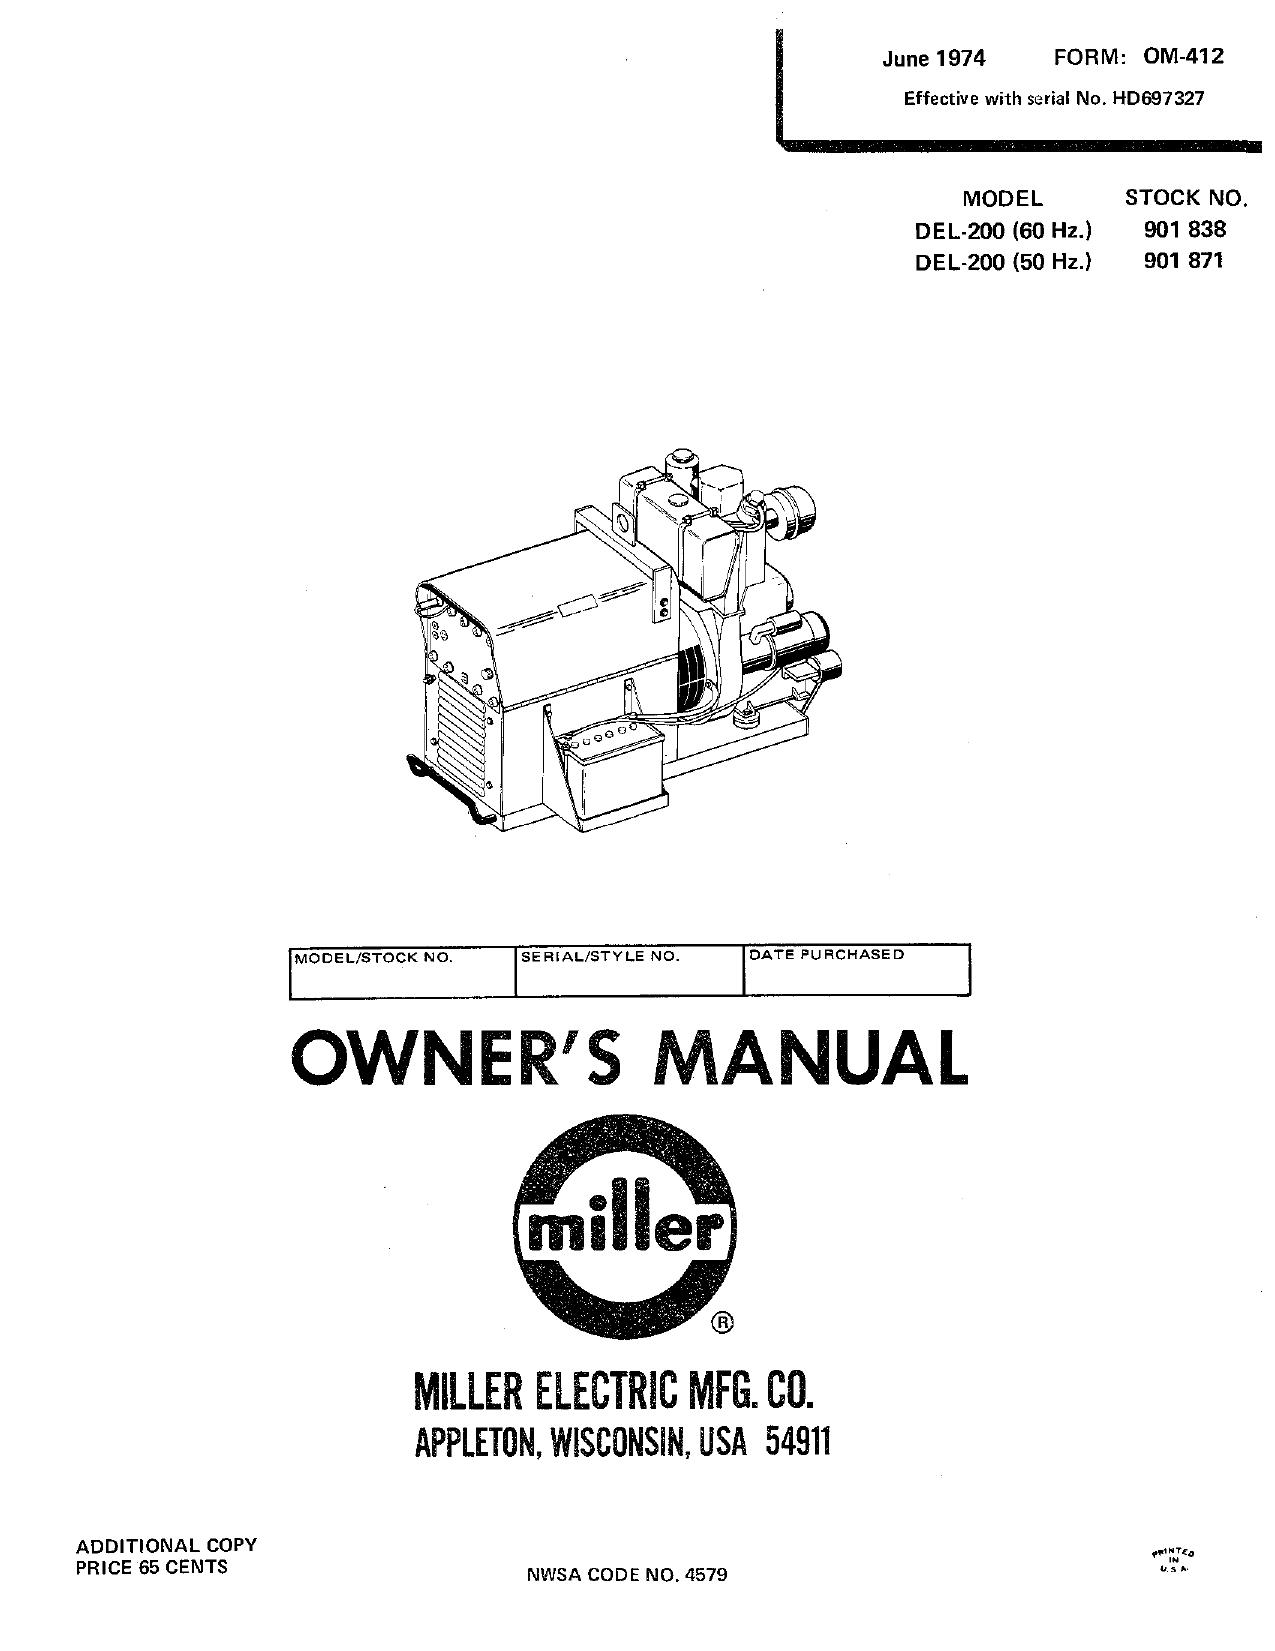 Miller HD40 Owner's manual   Manualzz